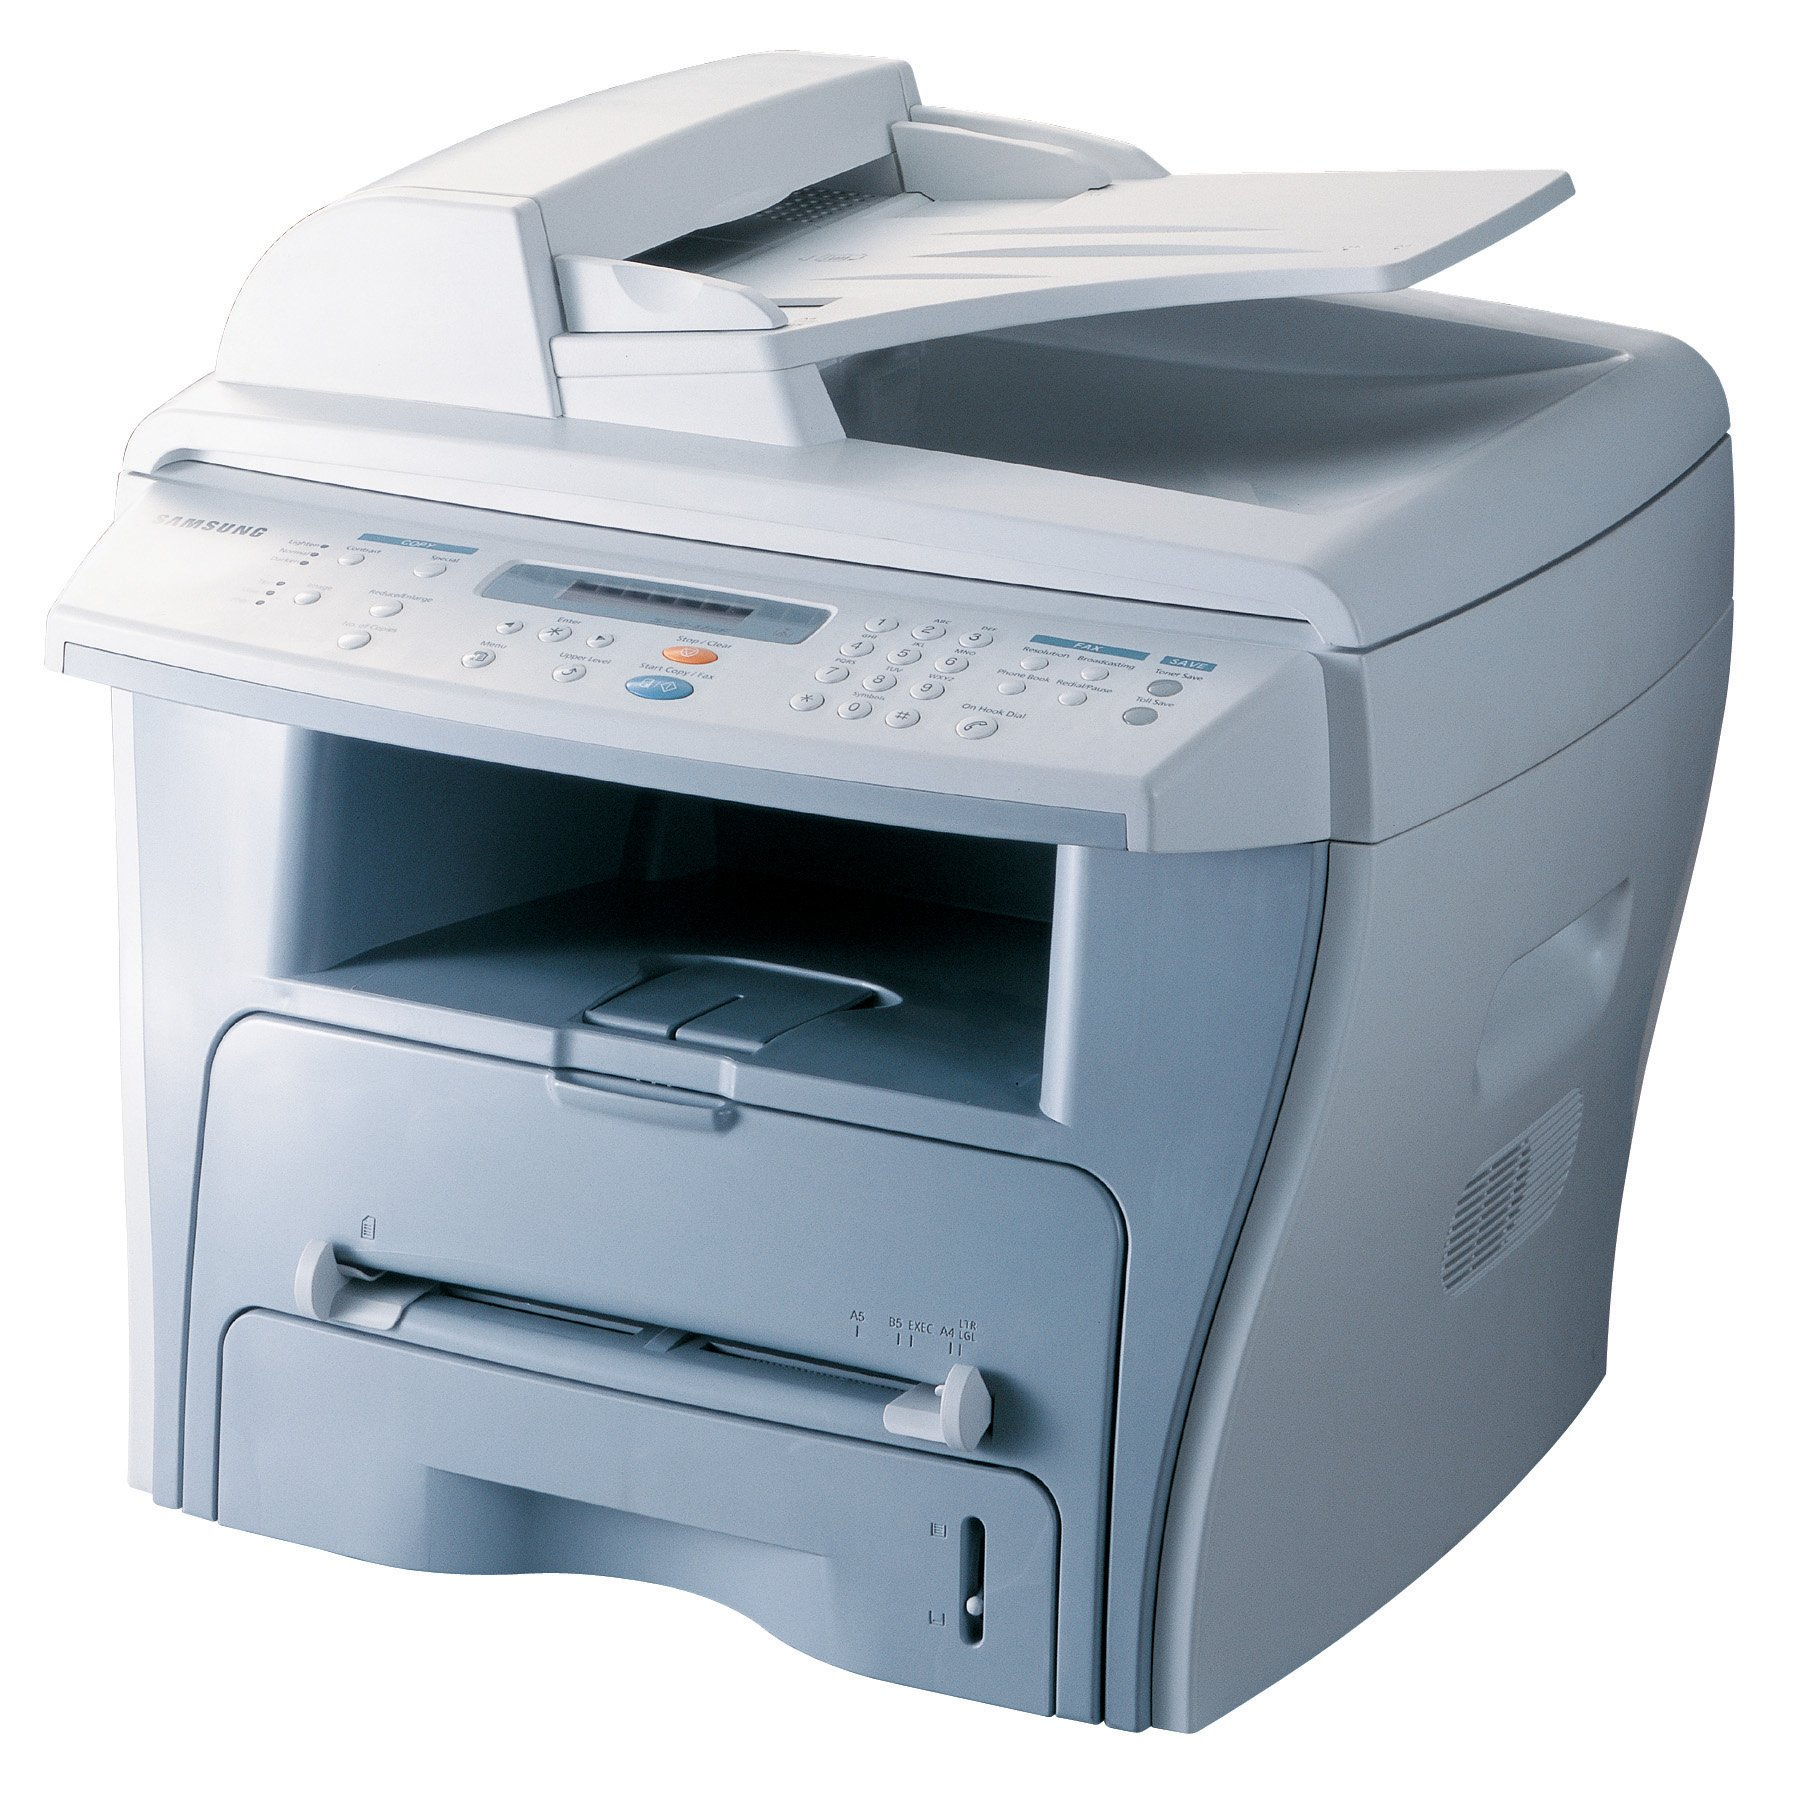 Принтер Samsung SCX-4216F